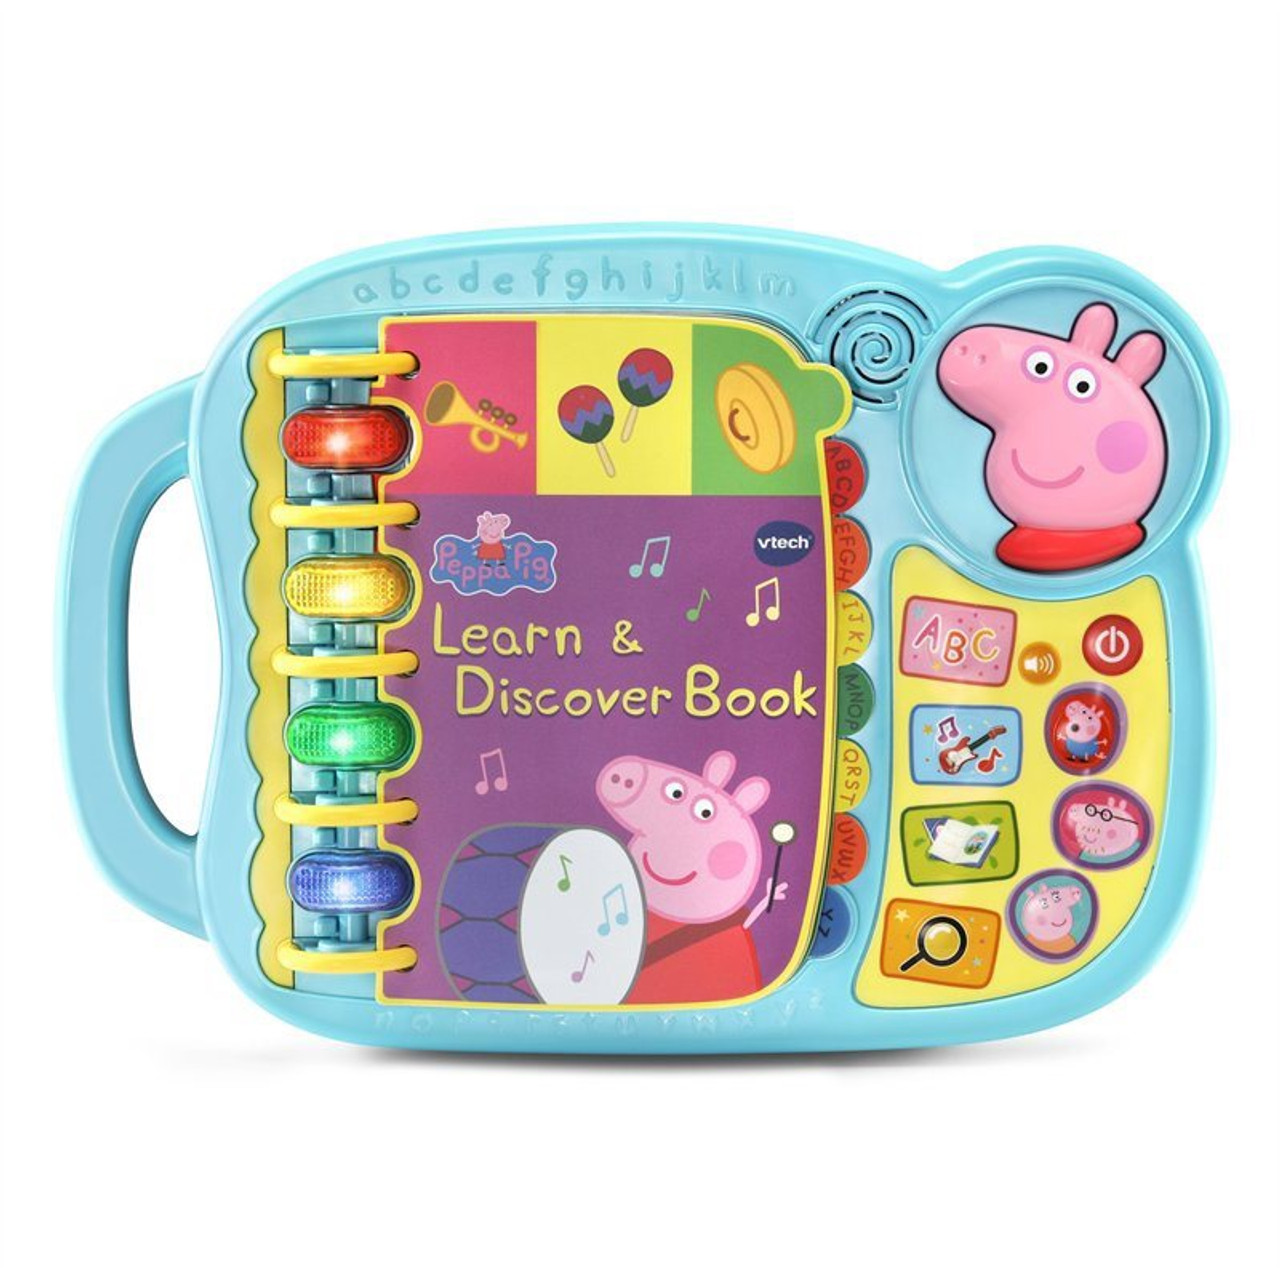 PEPPA PIG LEARN & DISCOVER BOOK